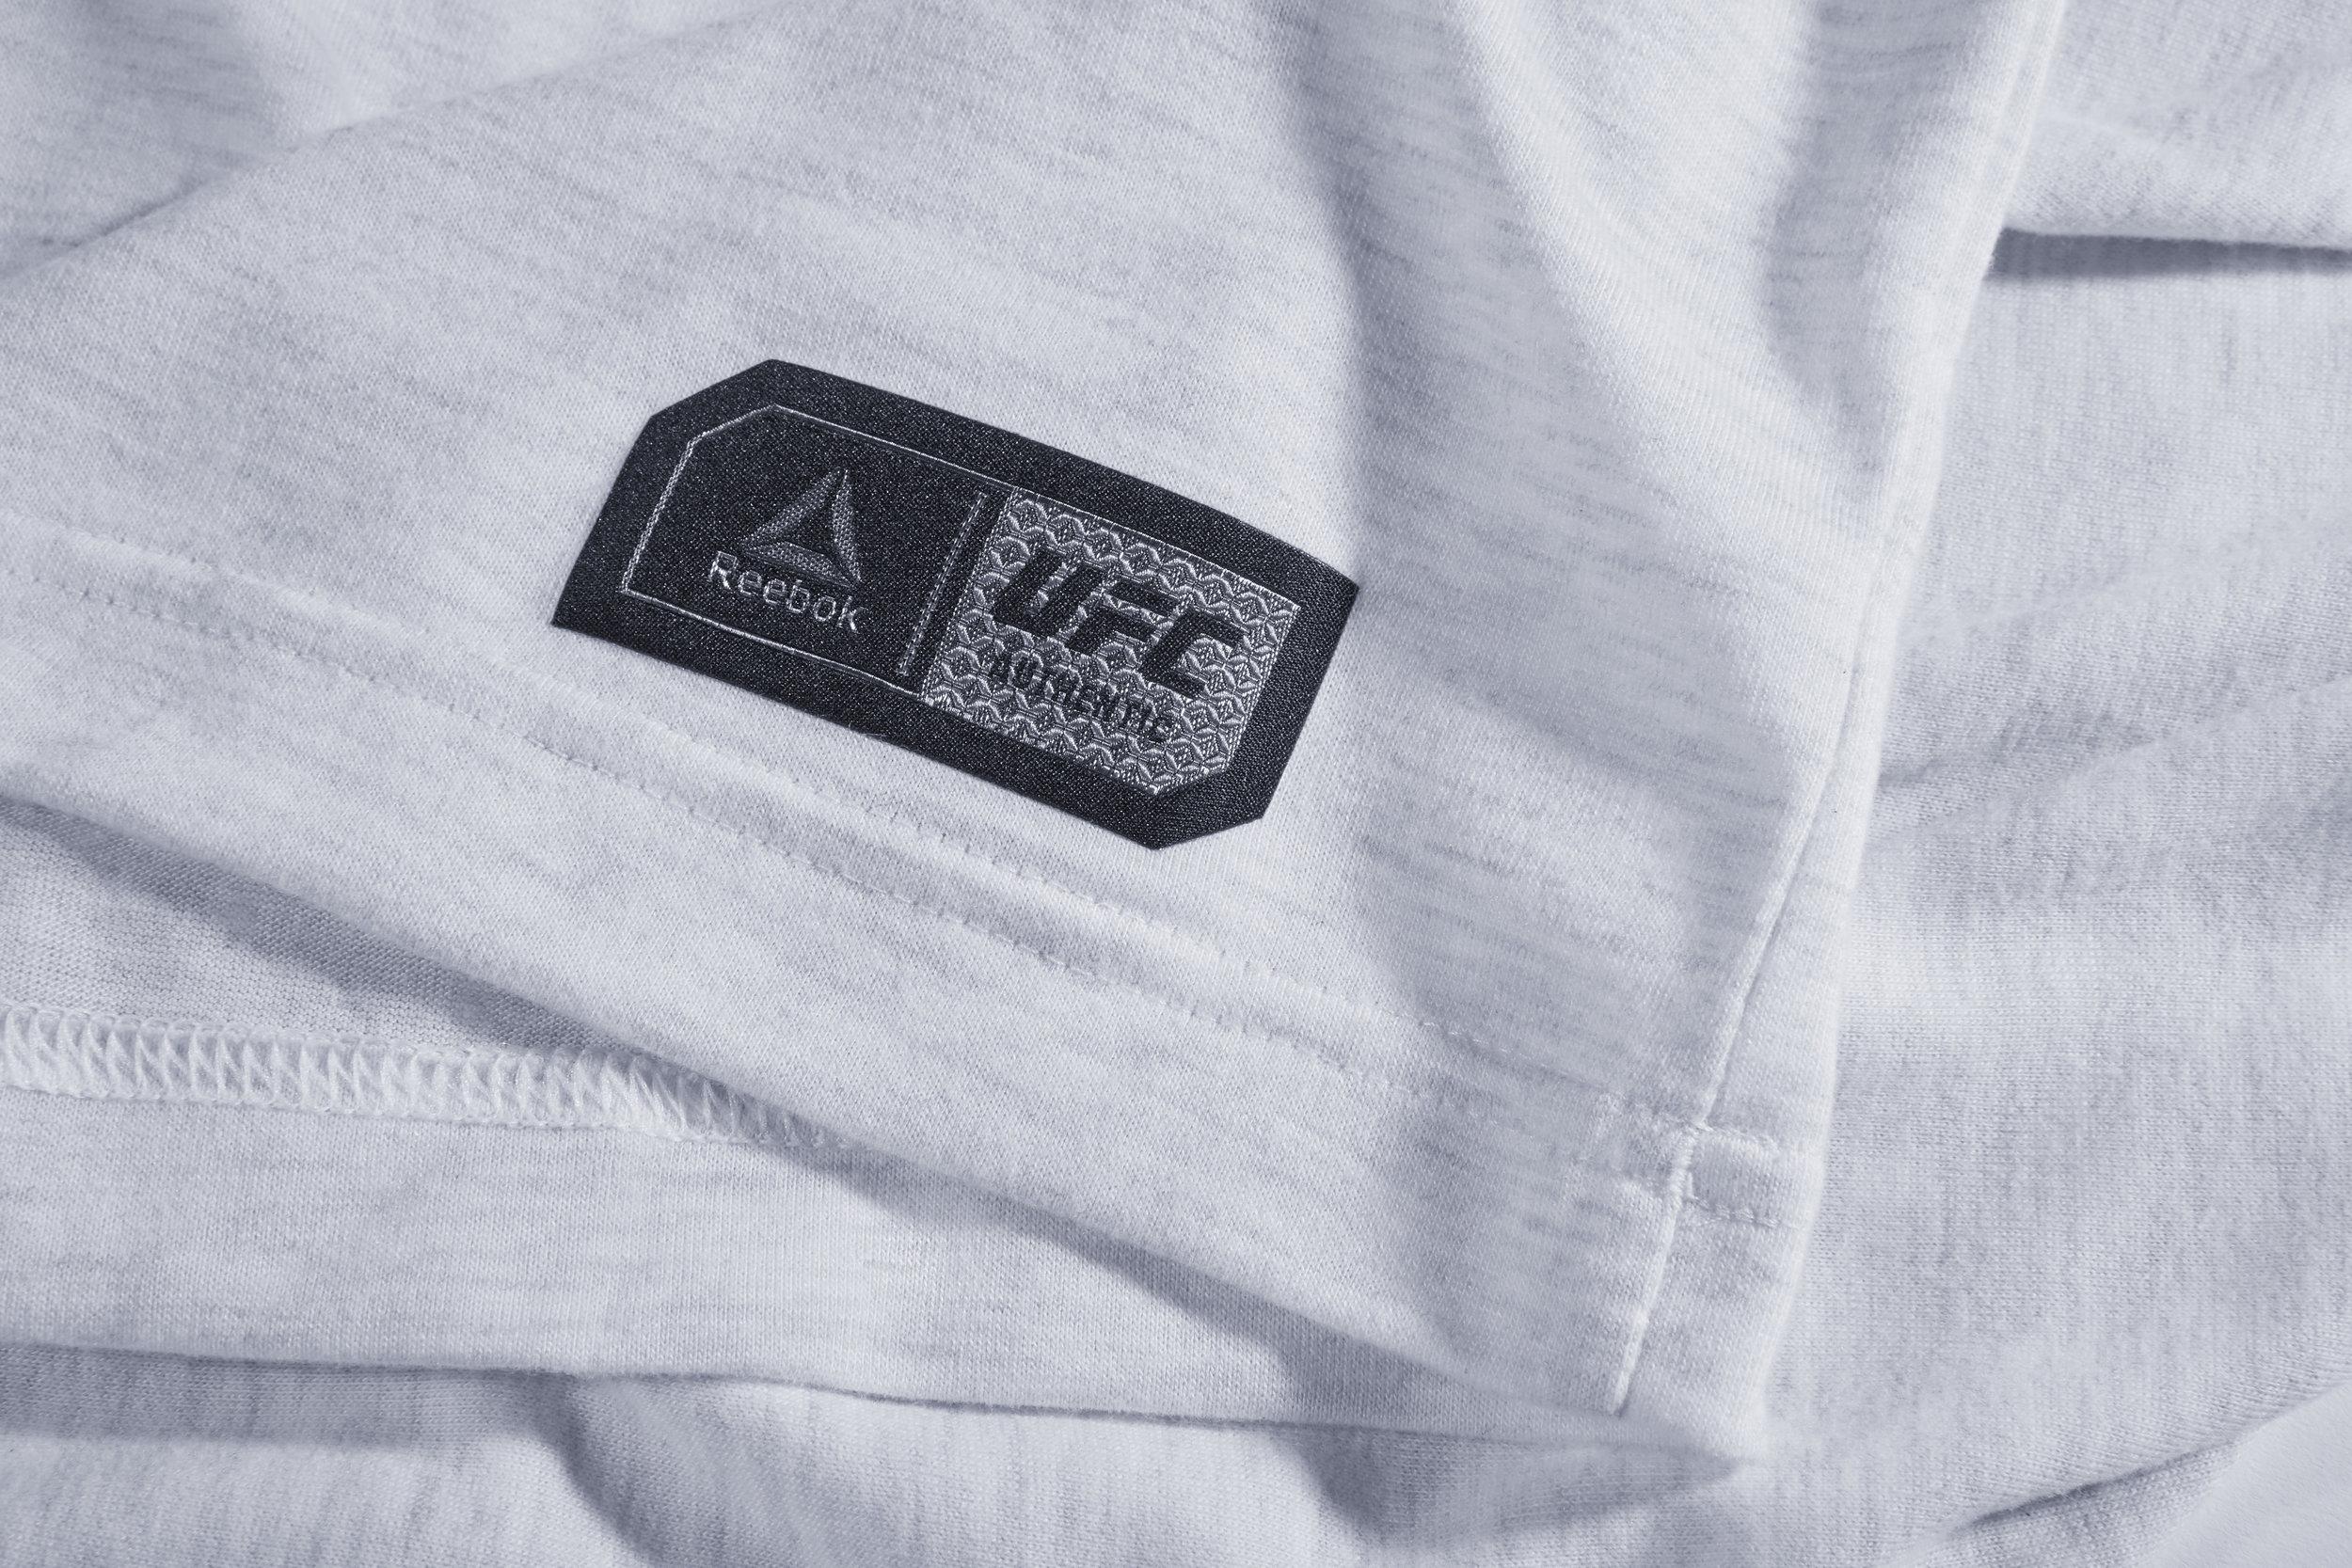 C21101_FW17_UFC_FNC_Tee_White_Label_Detail.jpg